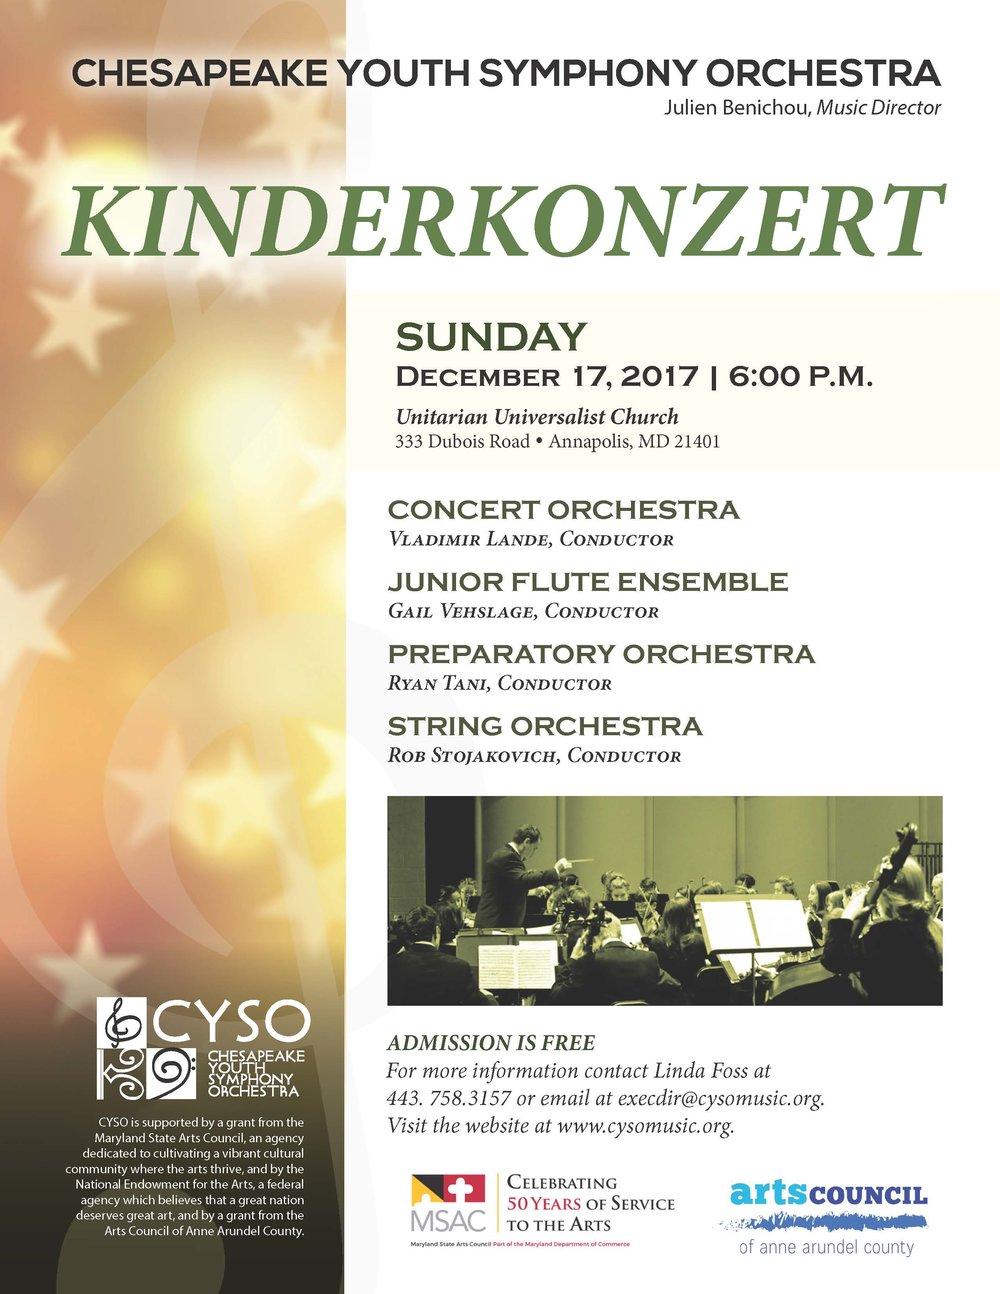 CYSO KinderKonzert Concert Flyer_update.jpg